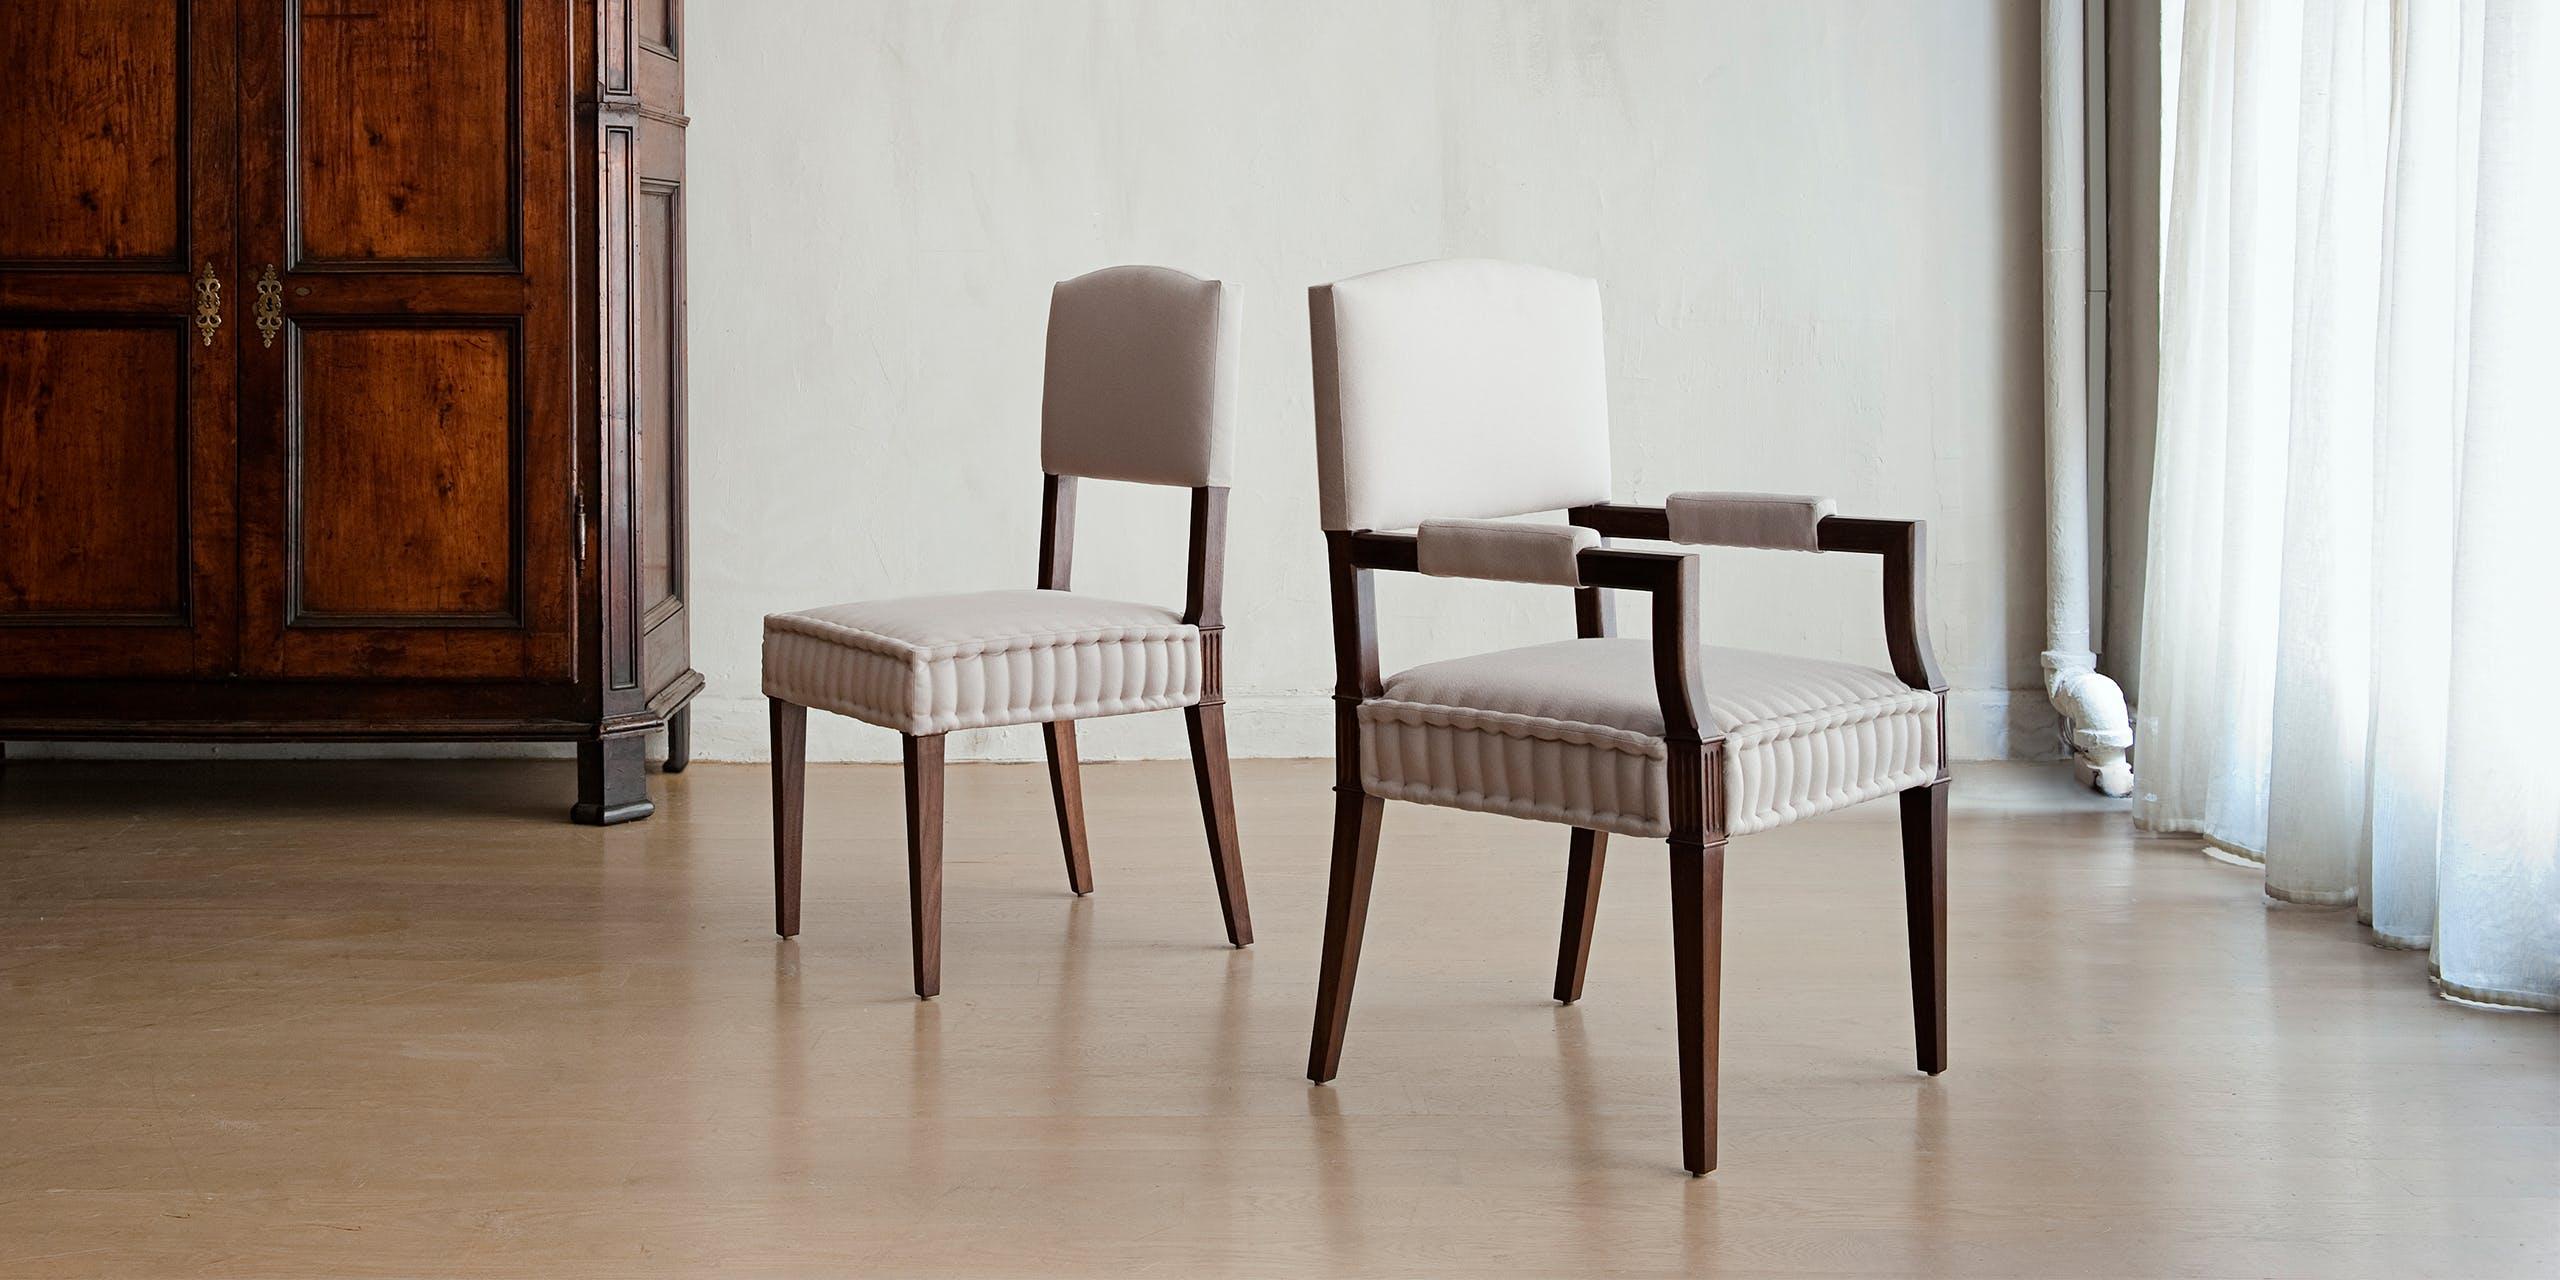 Brampton chair main.jpg?ixlib=rails 2.1